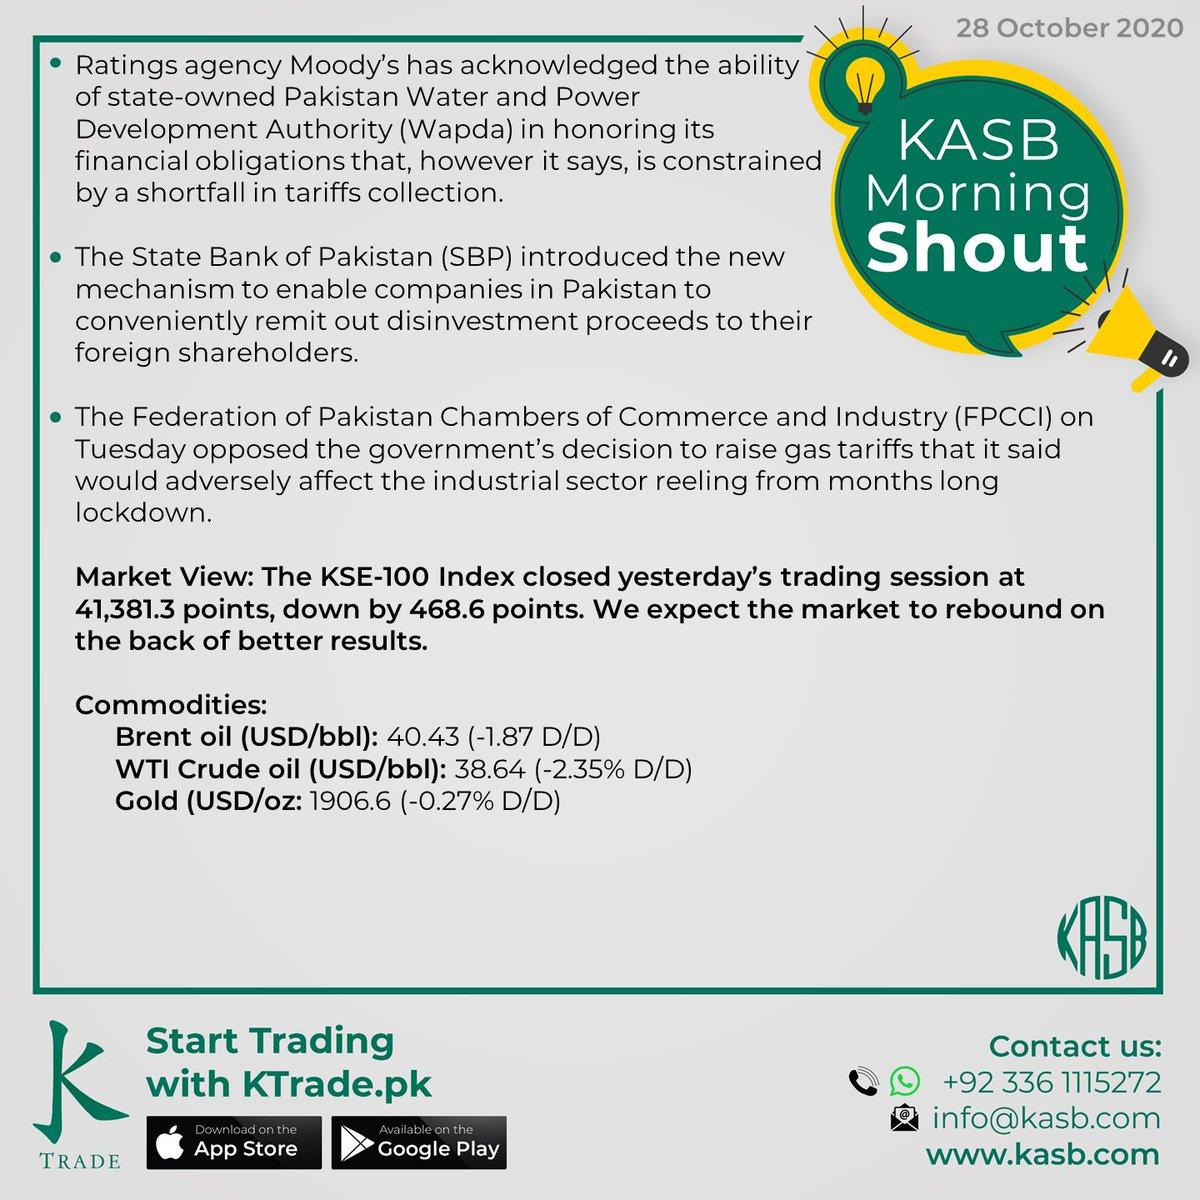 KASB Morning Shout: Our views on today's news #kasb #smartinvesting #psx #stockmarket #KTrade #onlinetrading #pakistaneconomy #imrankhan #sbp #inflation #kse100 #brokeragehouse #psxstocks #marketupdate #emergingmarkets #frontiermarkets #news #morning #today #views https://t.co/Nv1Sfuyqog